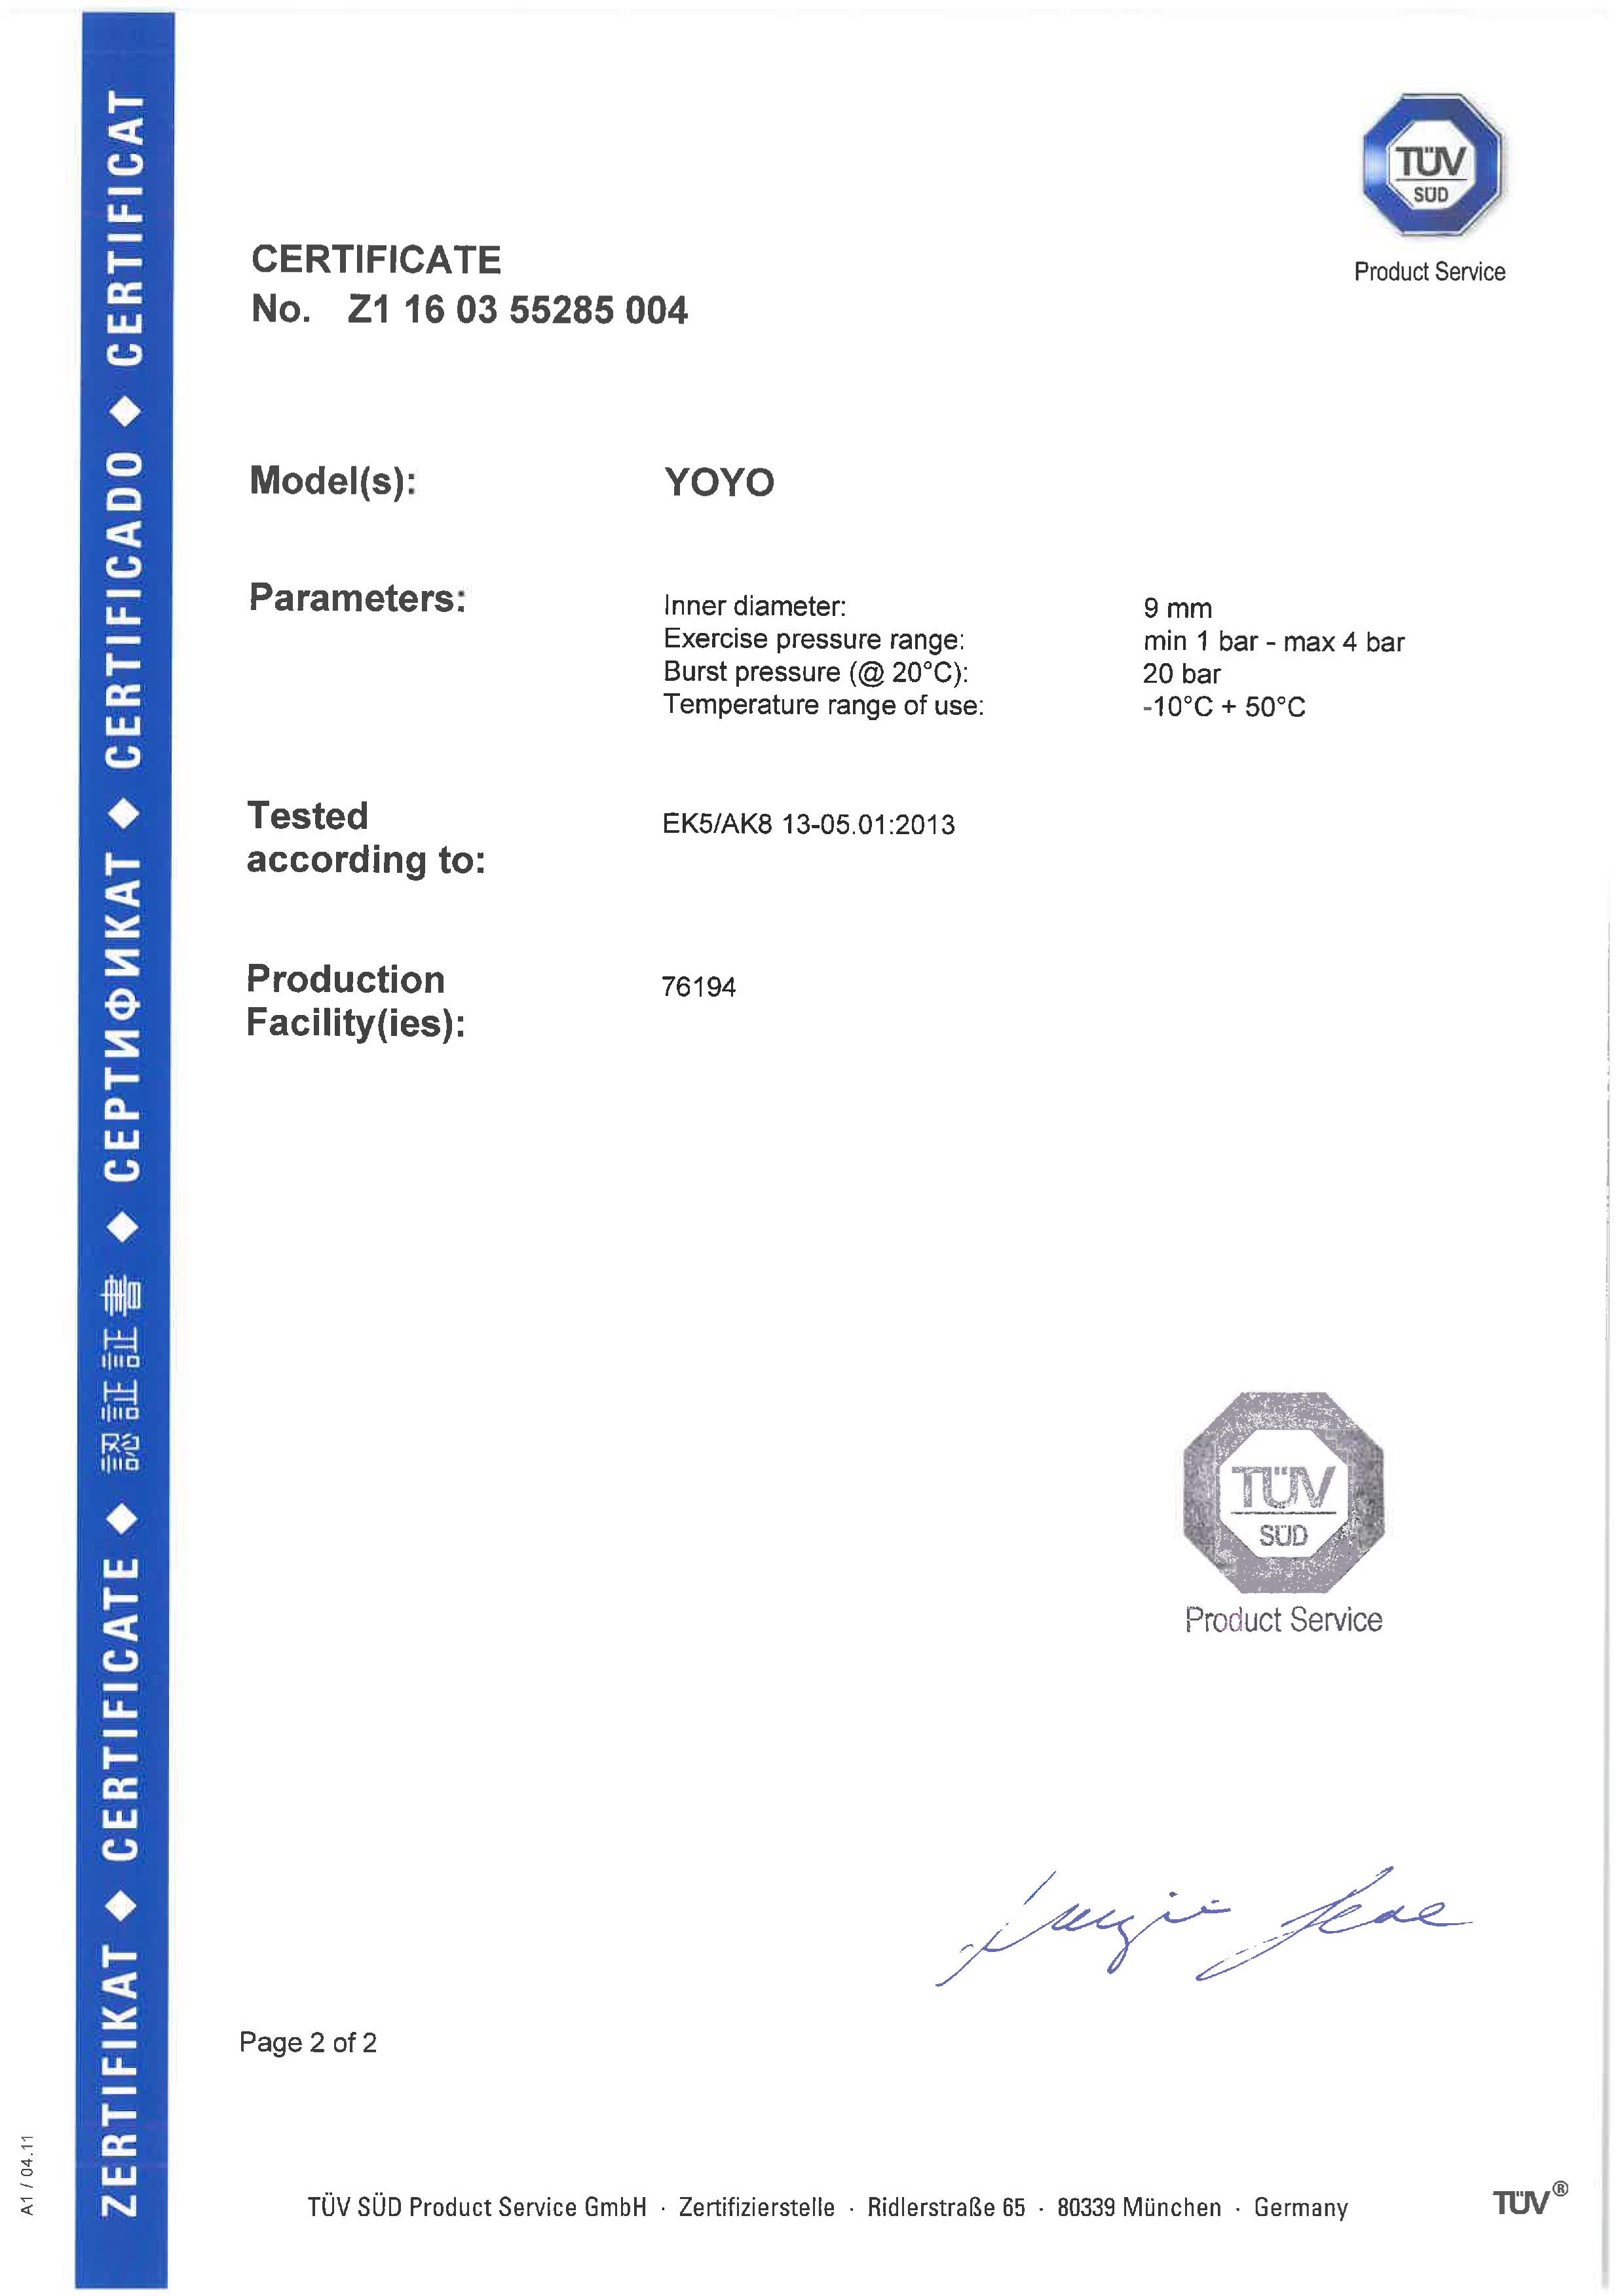 Сертификат_YOYO_TUV_SUD-2.jpg